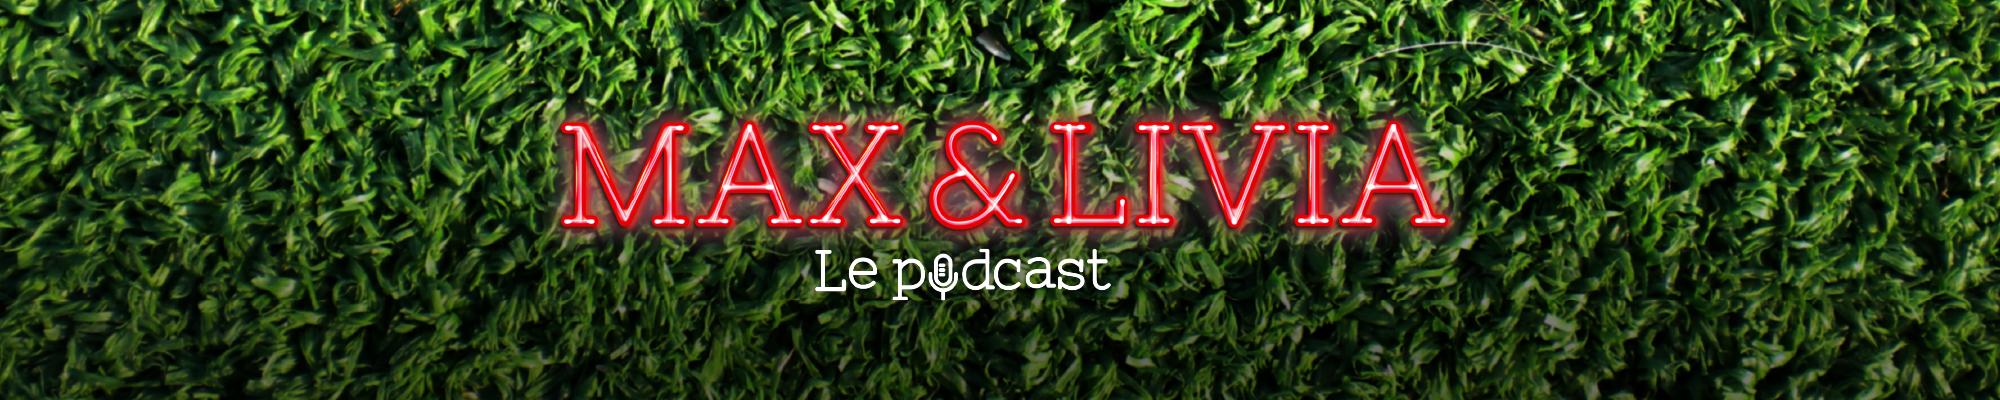 Max et Livia: le podcast